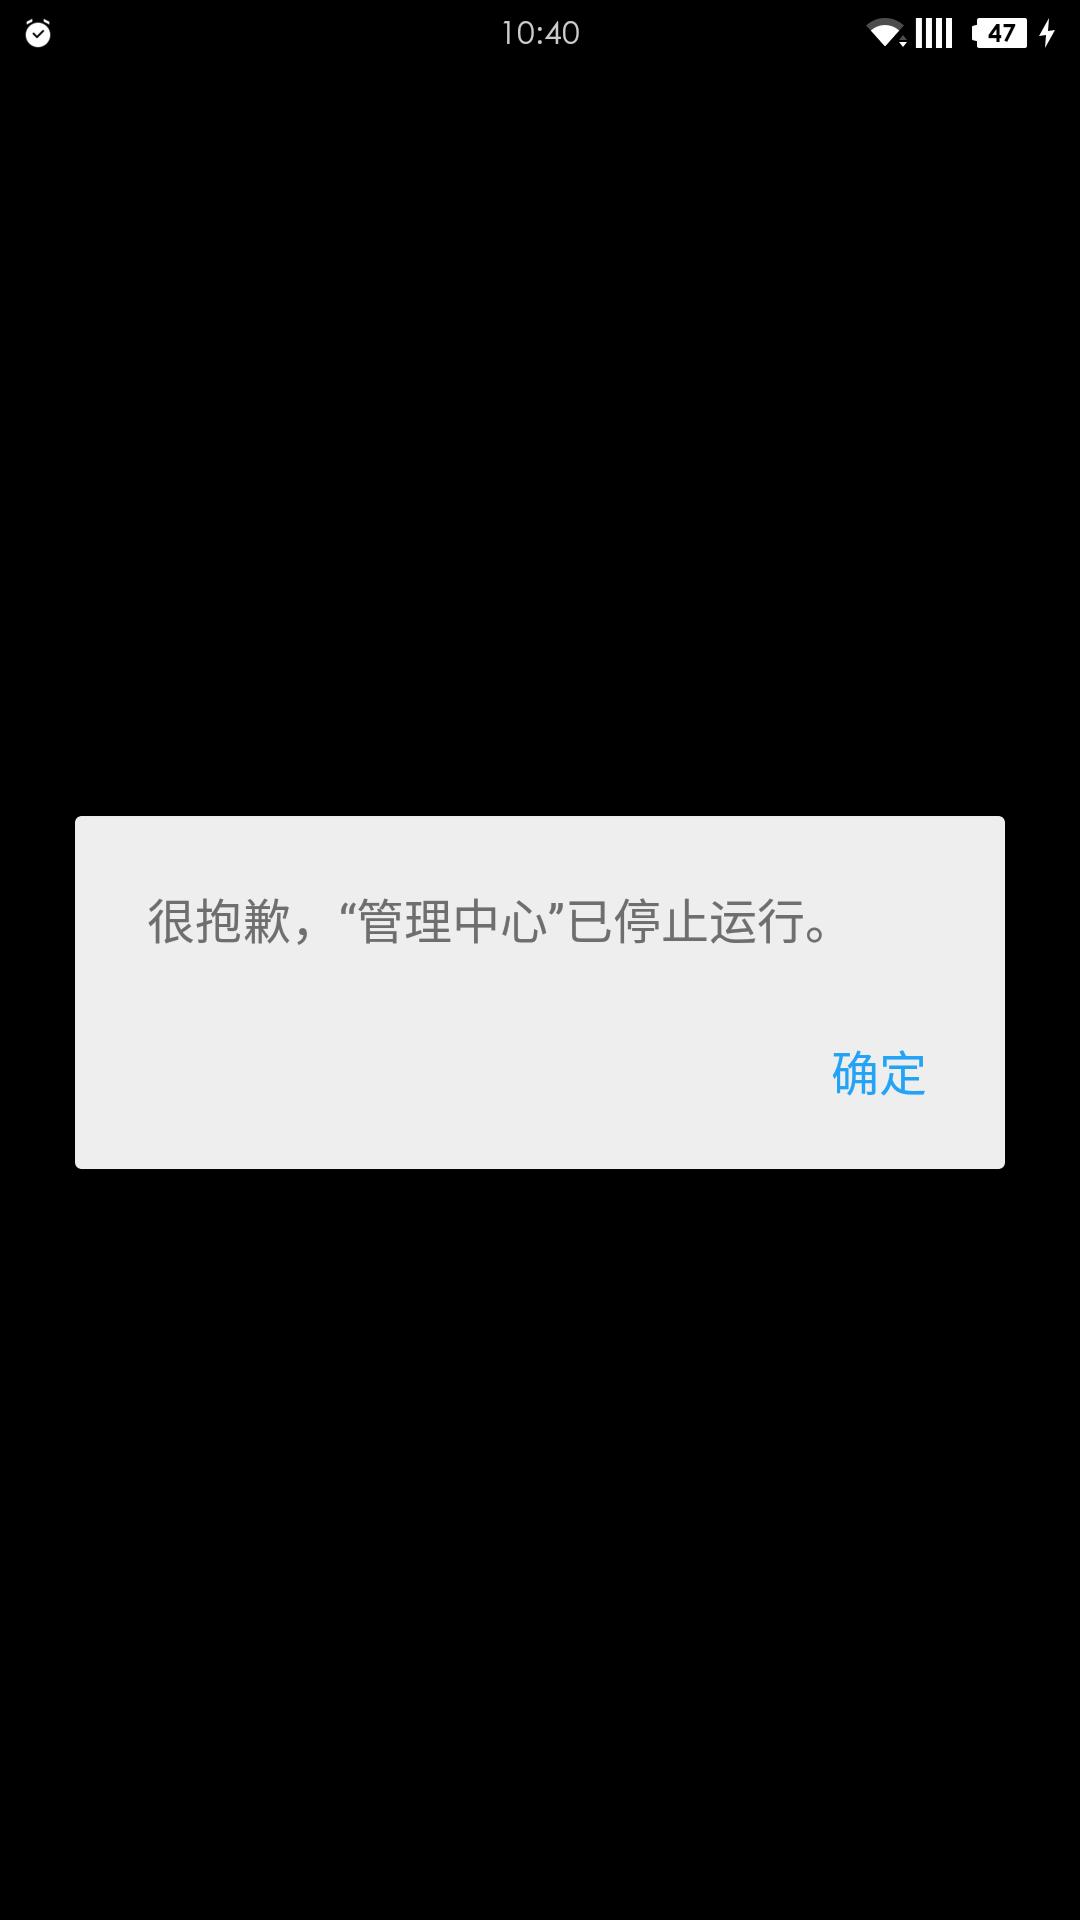 Screenshot_2016-03-26-10-40-55.png